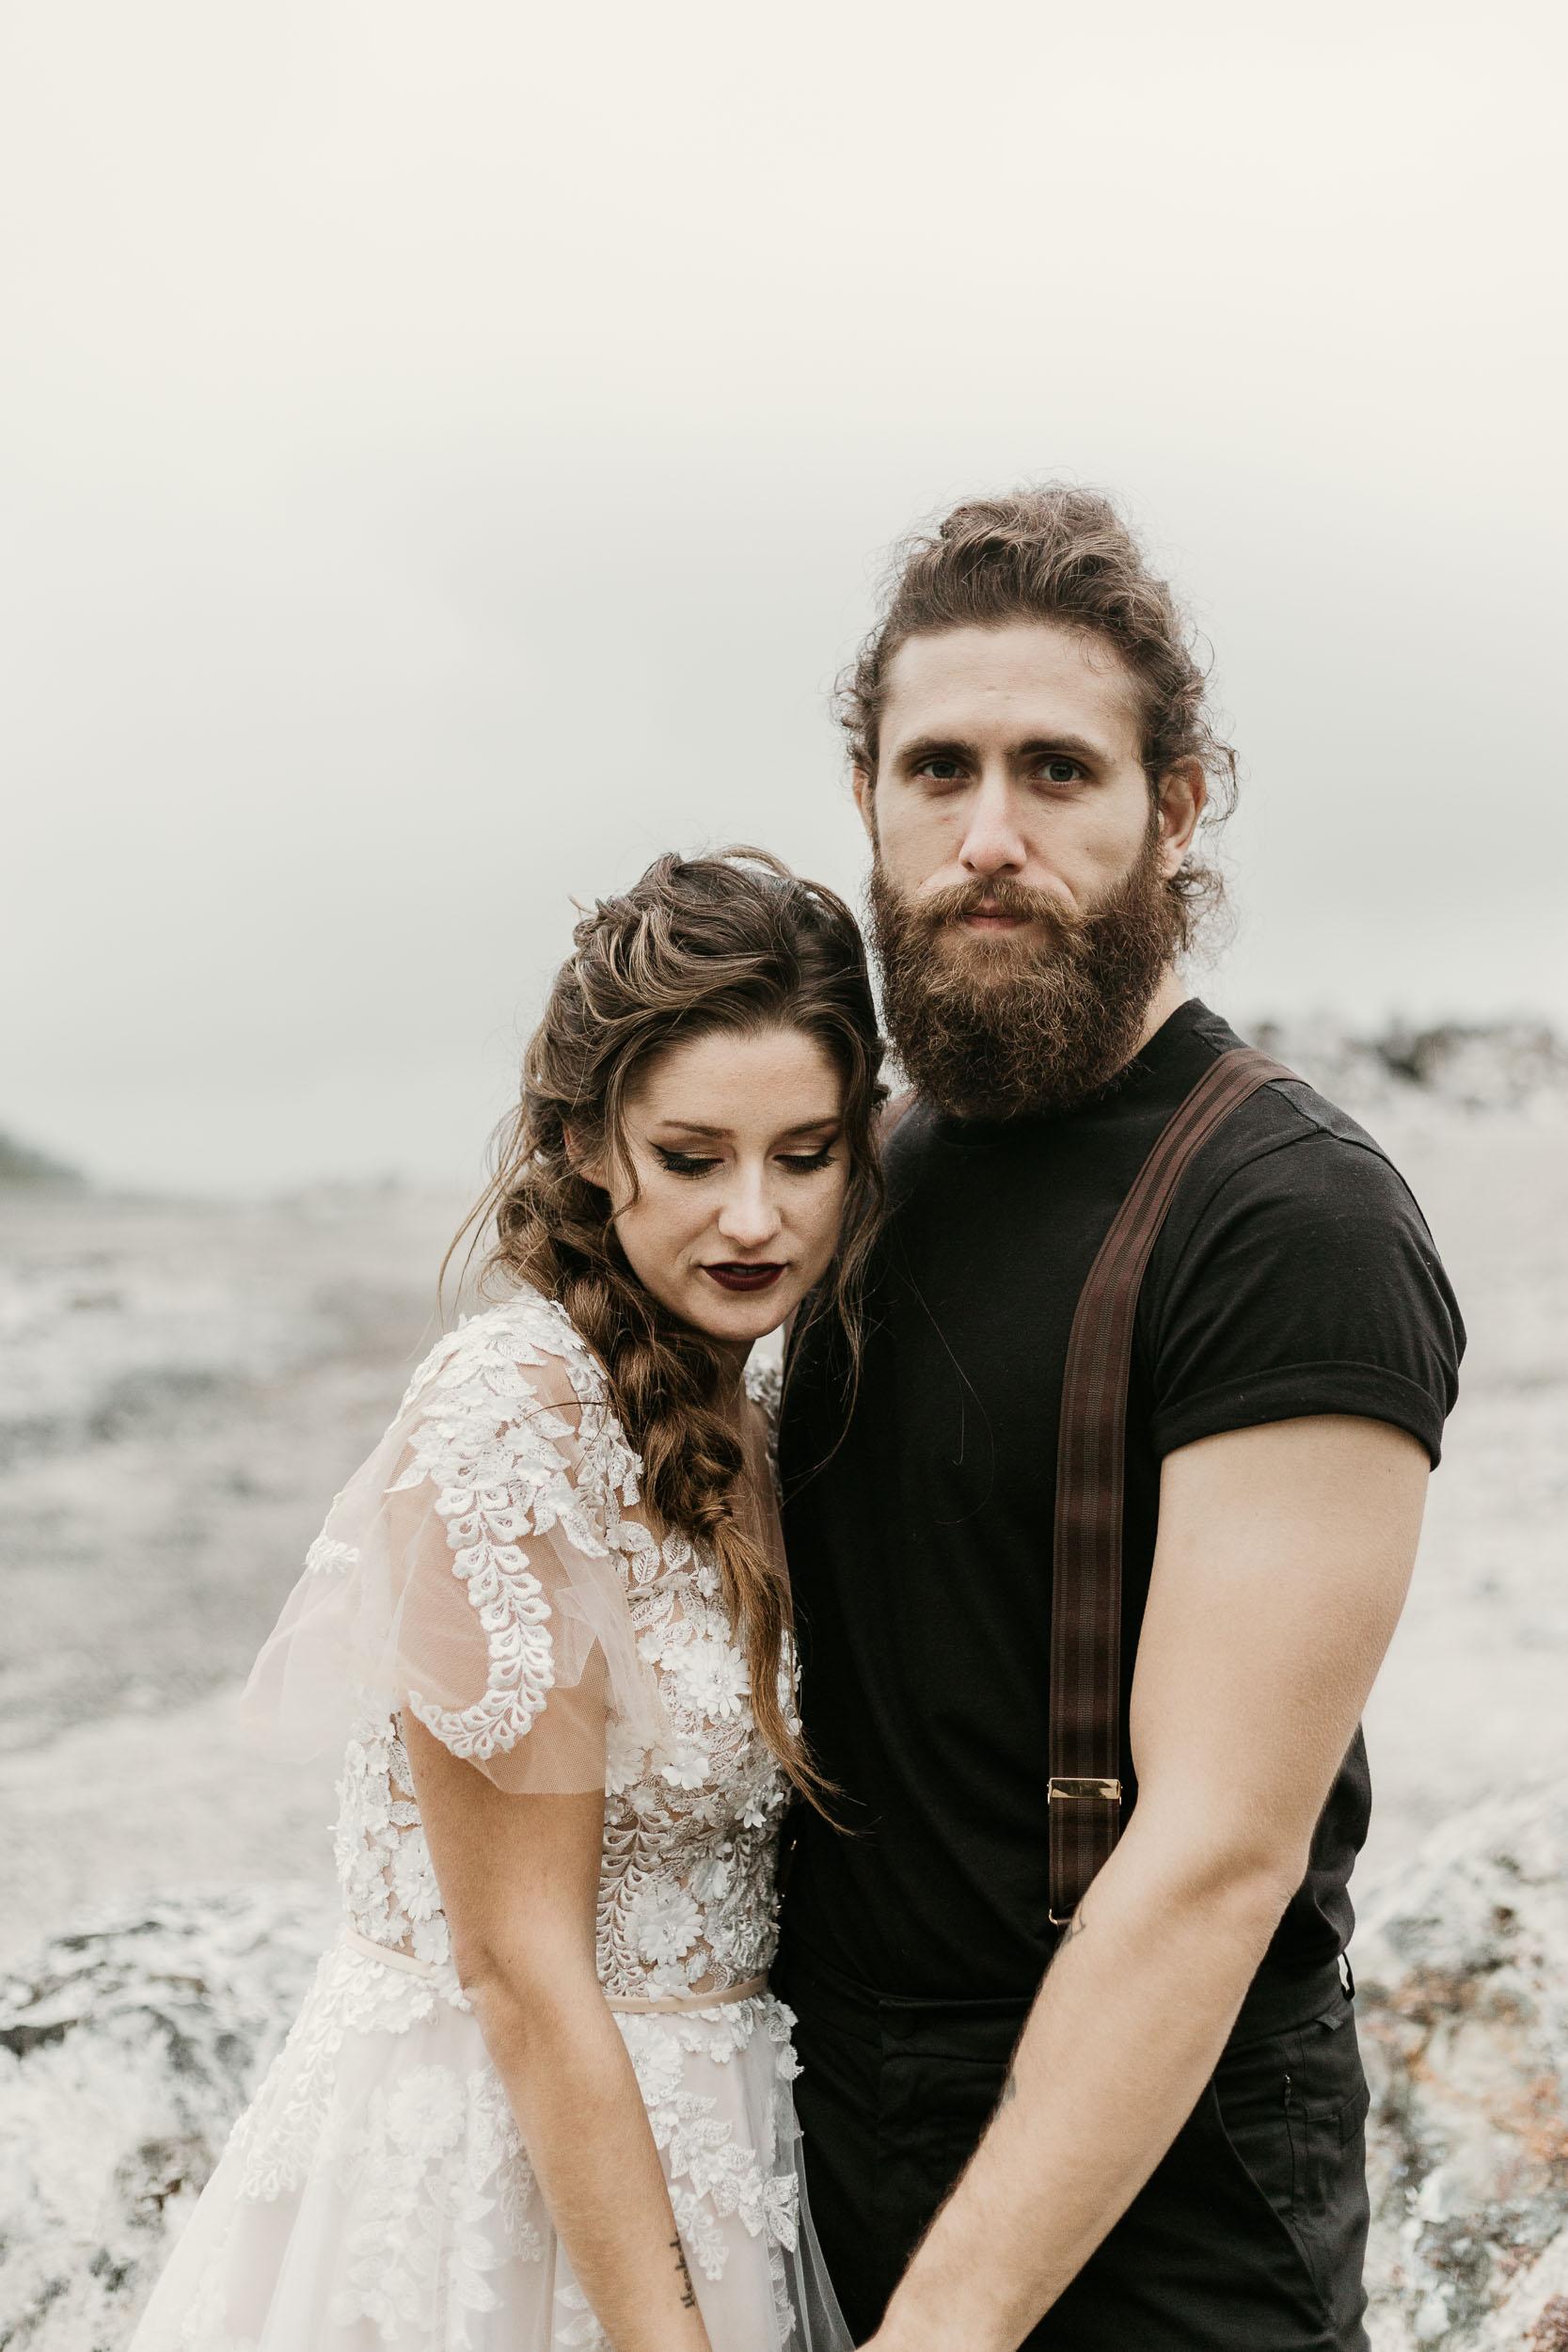 intimate-wedding-elopement-photographer-ottawa-toronto-1145.jpg